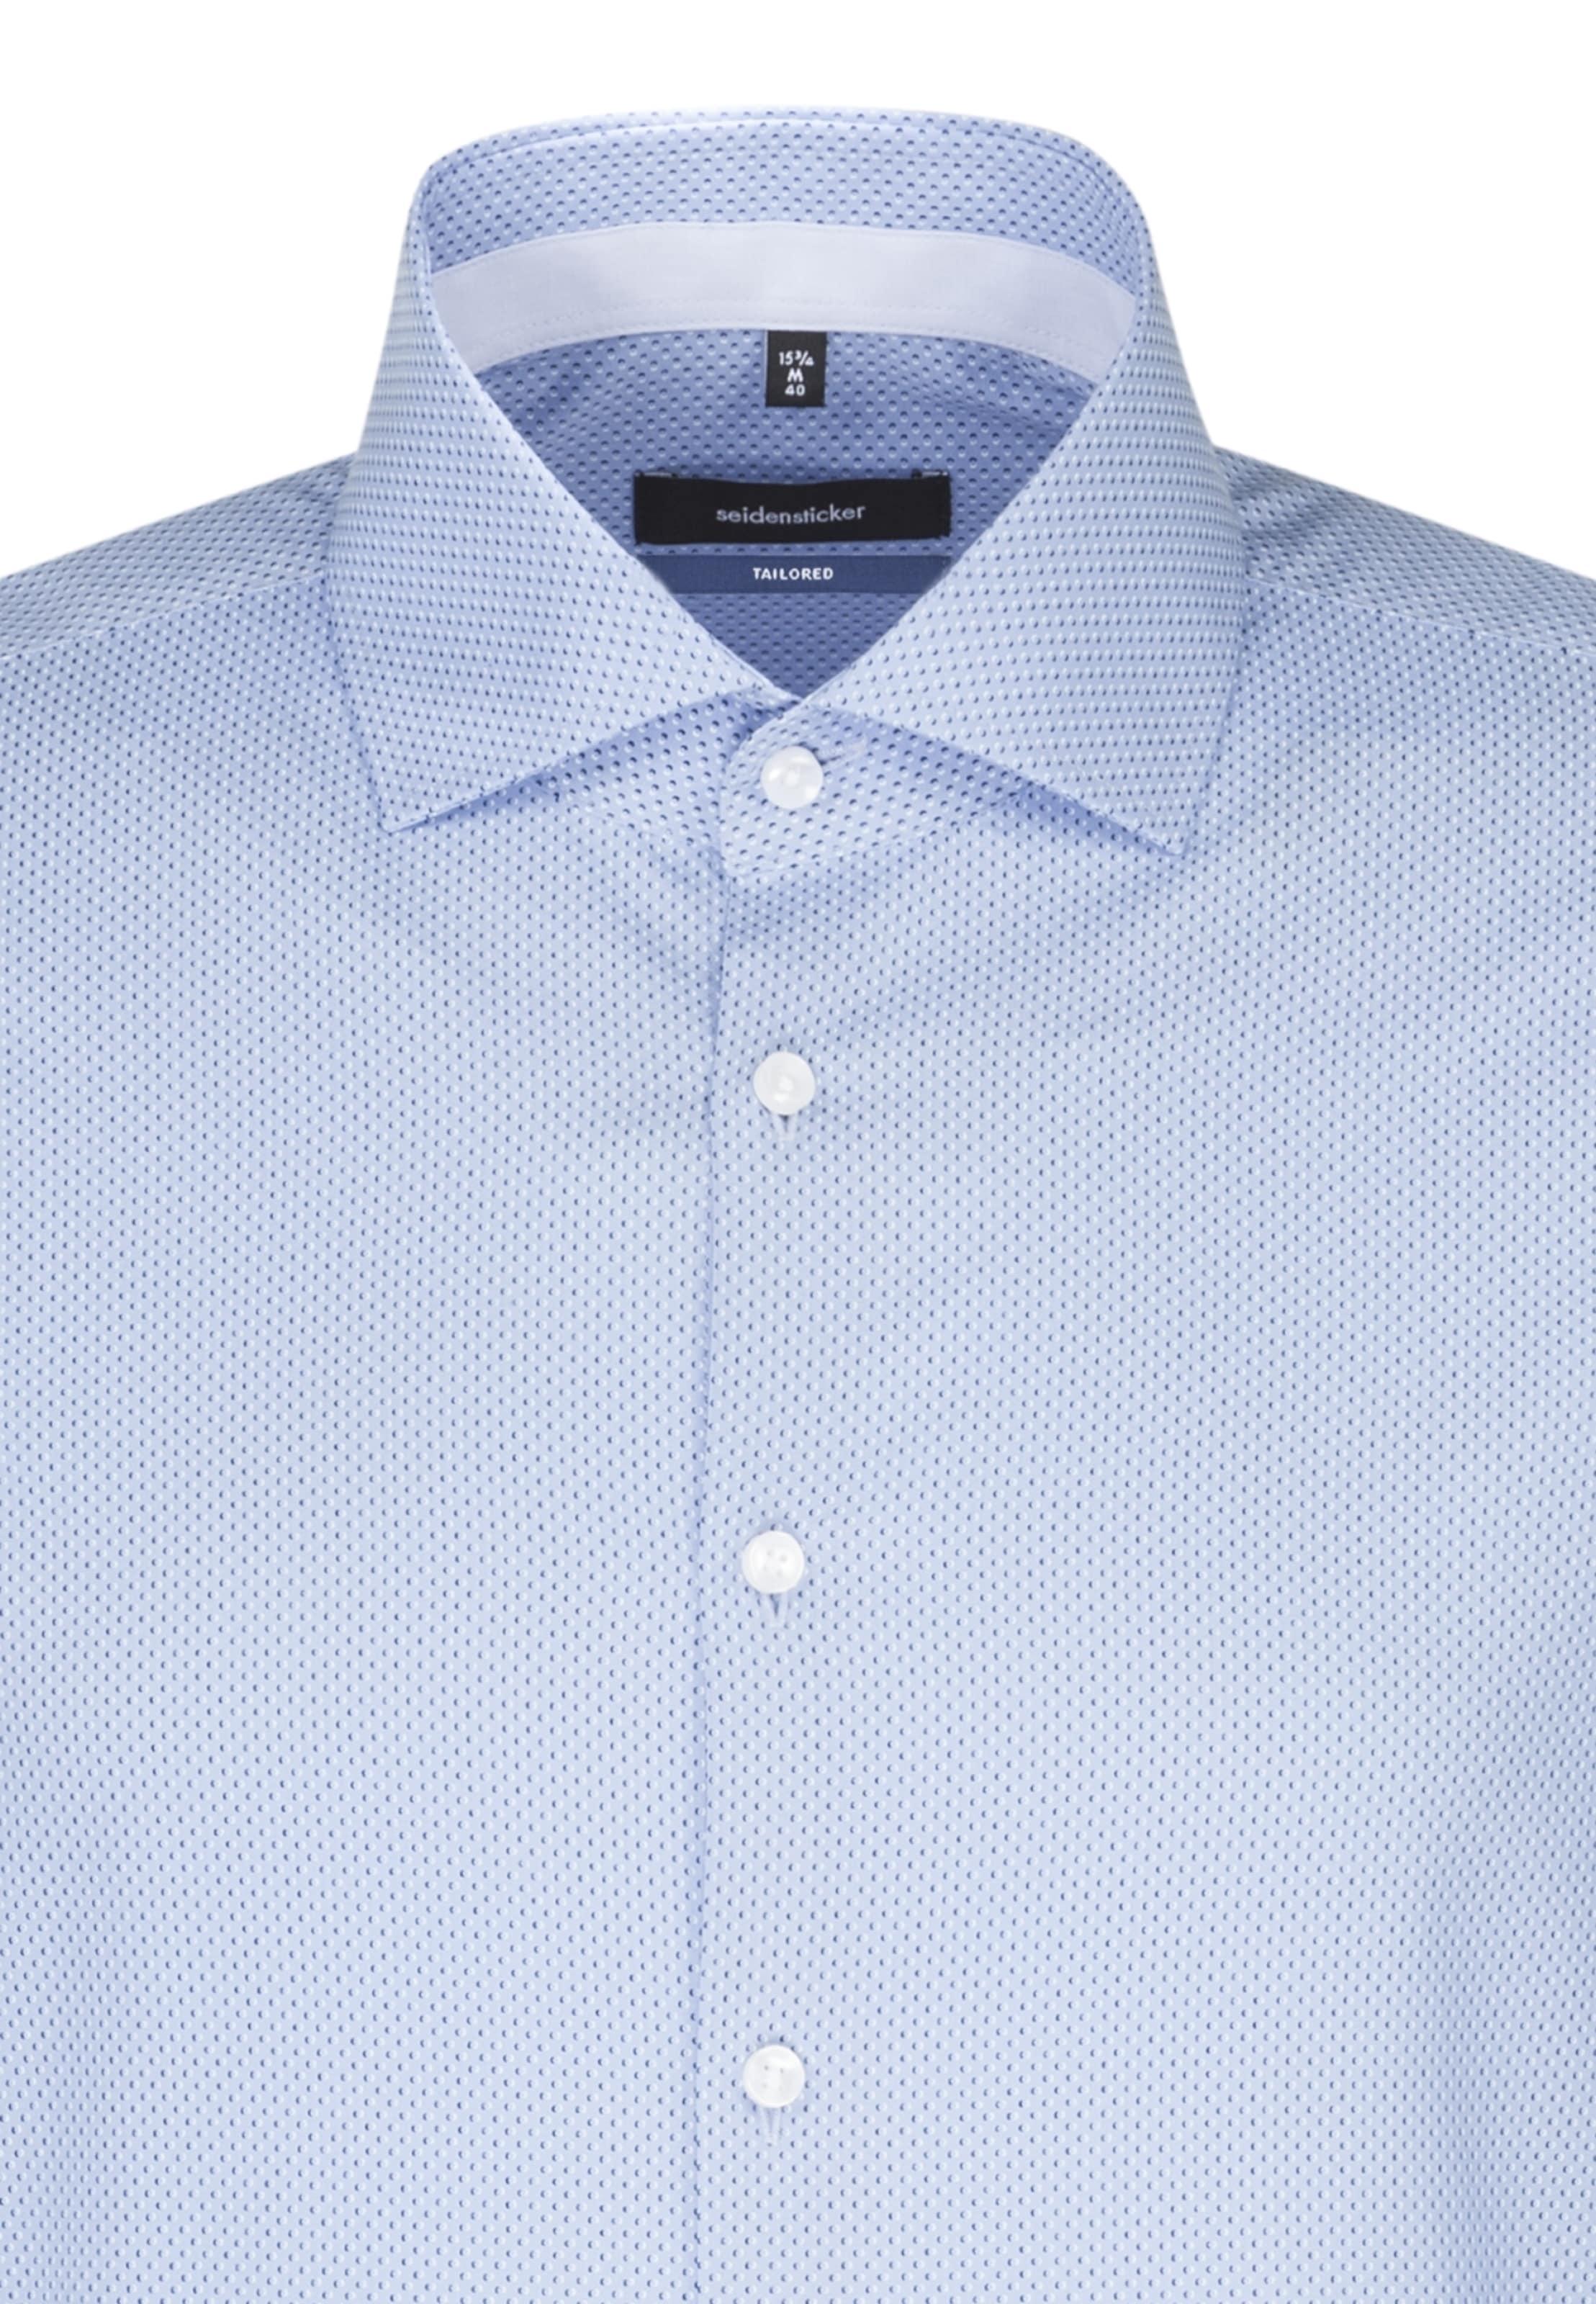 Seidensticker Hemd Hemd Hellblau Seidensticker In mNnw8v0O